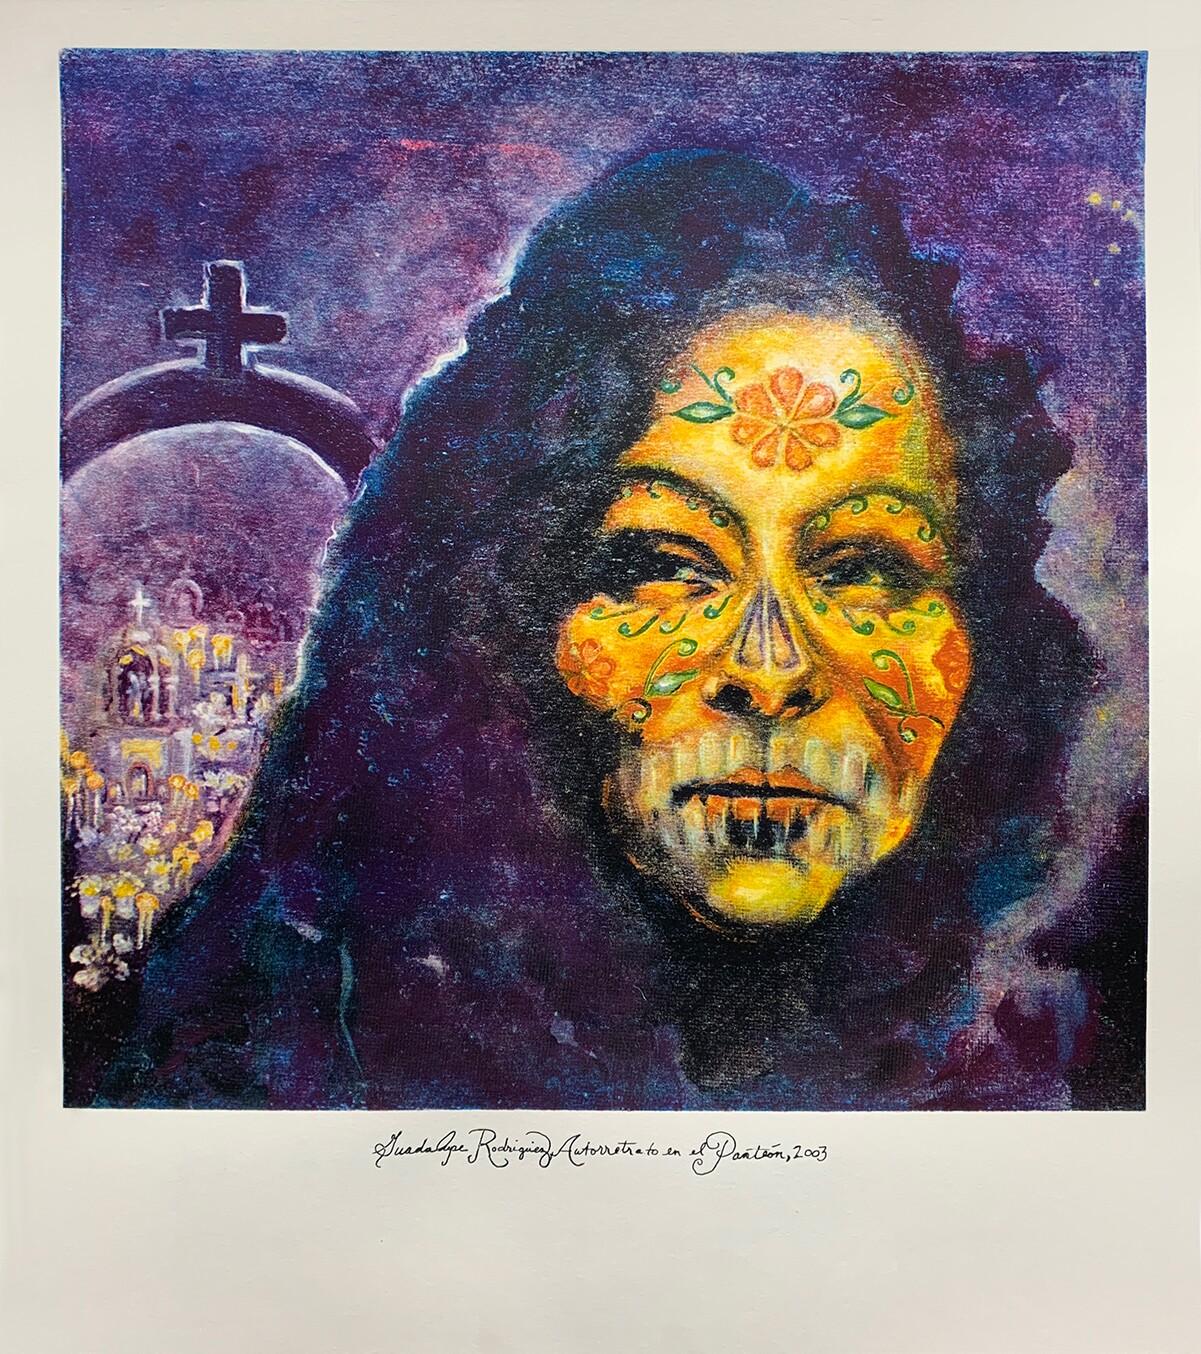 """Guadalupe Rodriguez, Autorretrato en el Panteón, 2003"" by Sandy Rodriguez is the commemorative print for Self Help Graphics' Dia de los Muertos in 2020 | Courtesy of Self Help Graphics & Art"